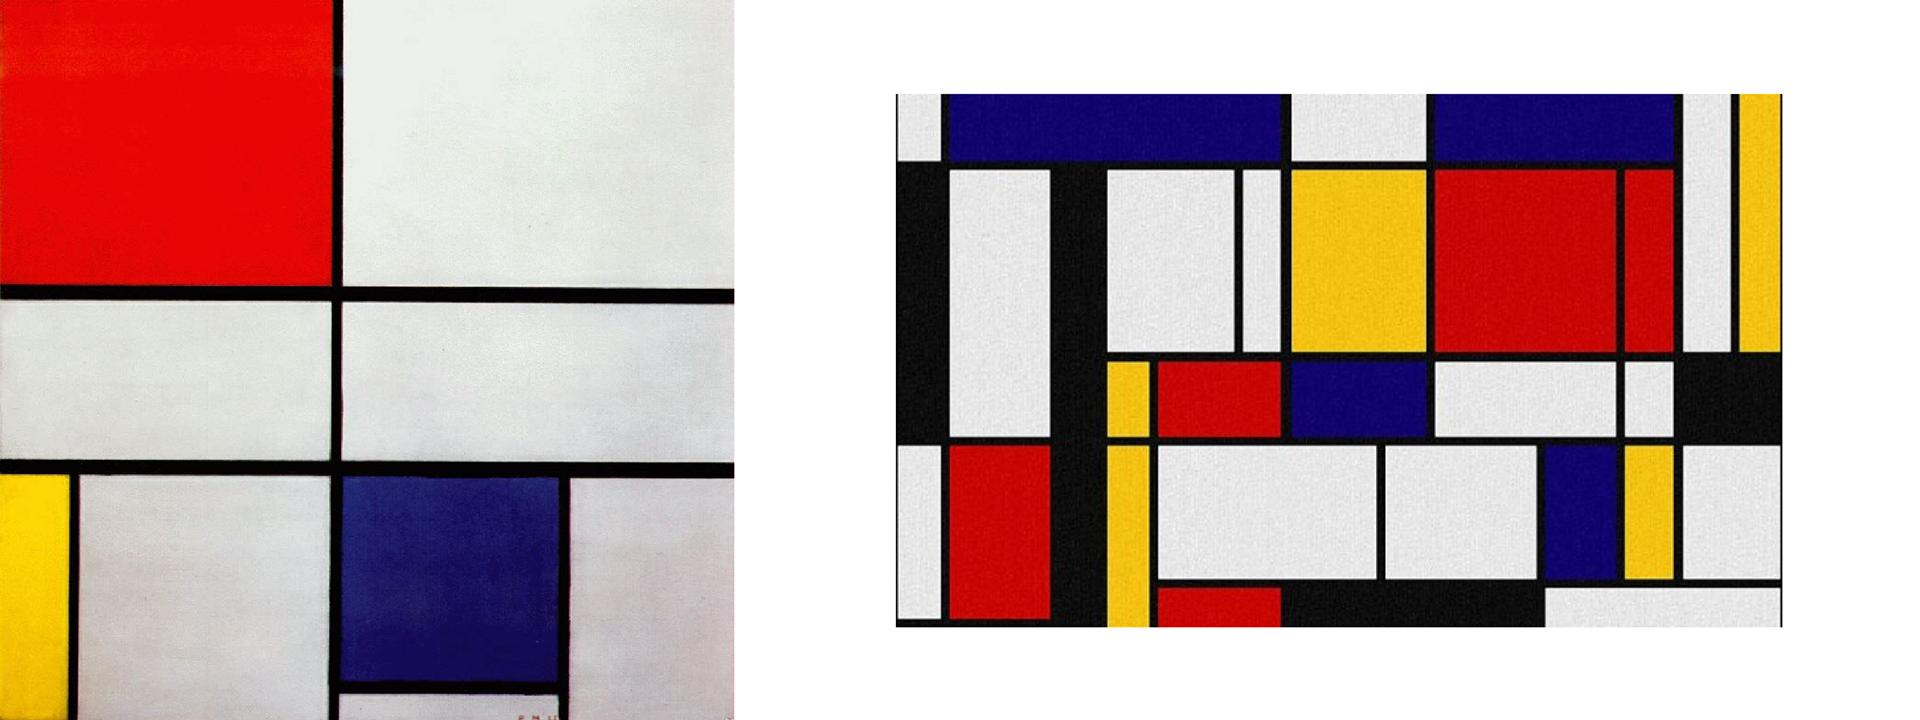 Piet Mondrian paintings